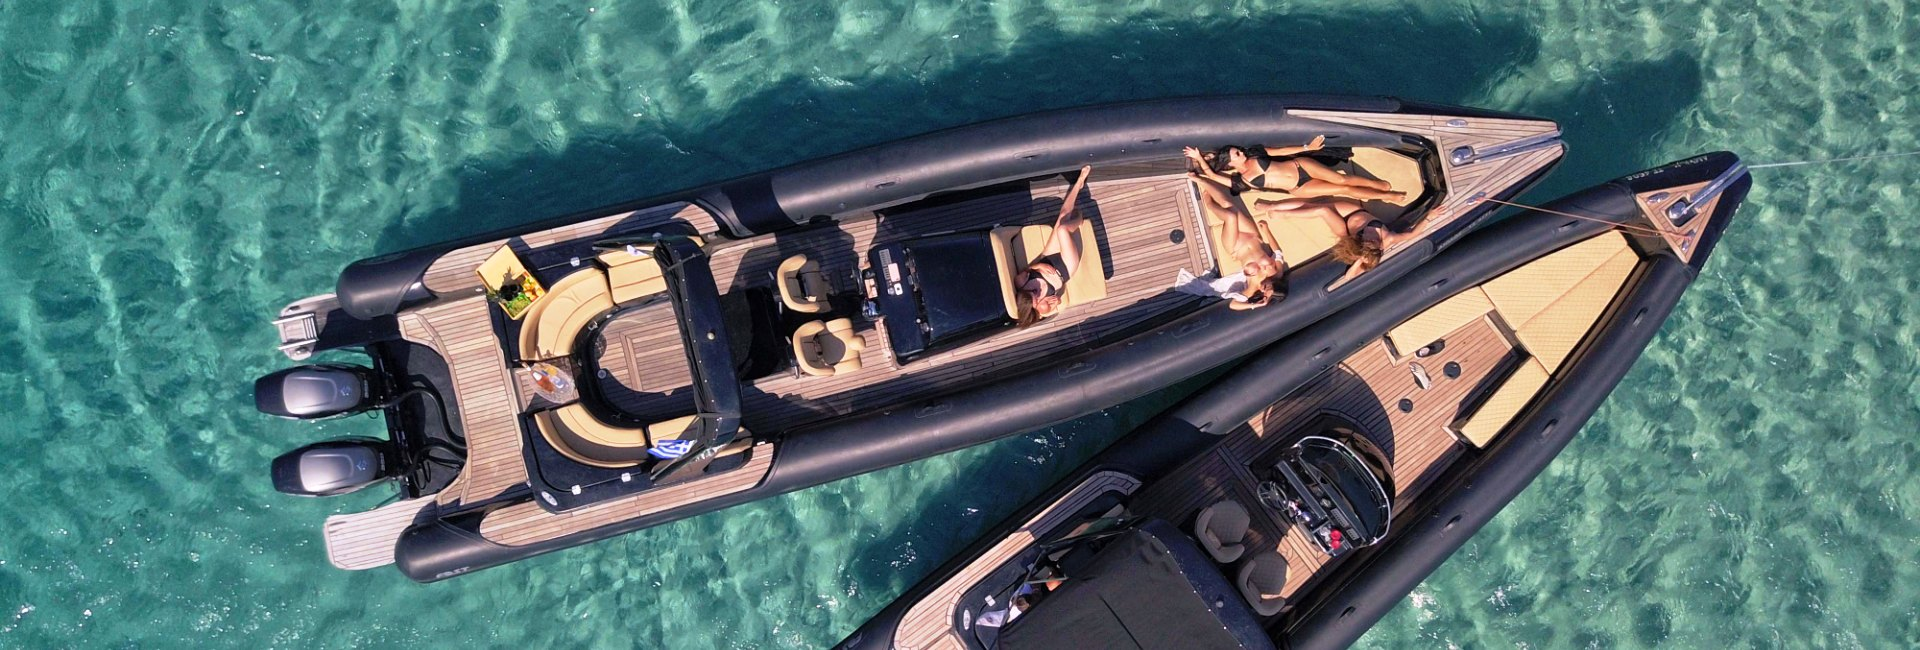 Mykonos Rib Cruises - Don Blue